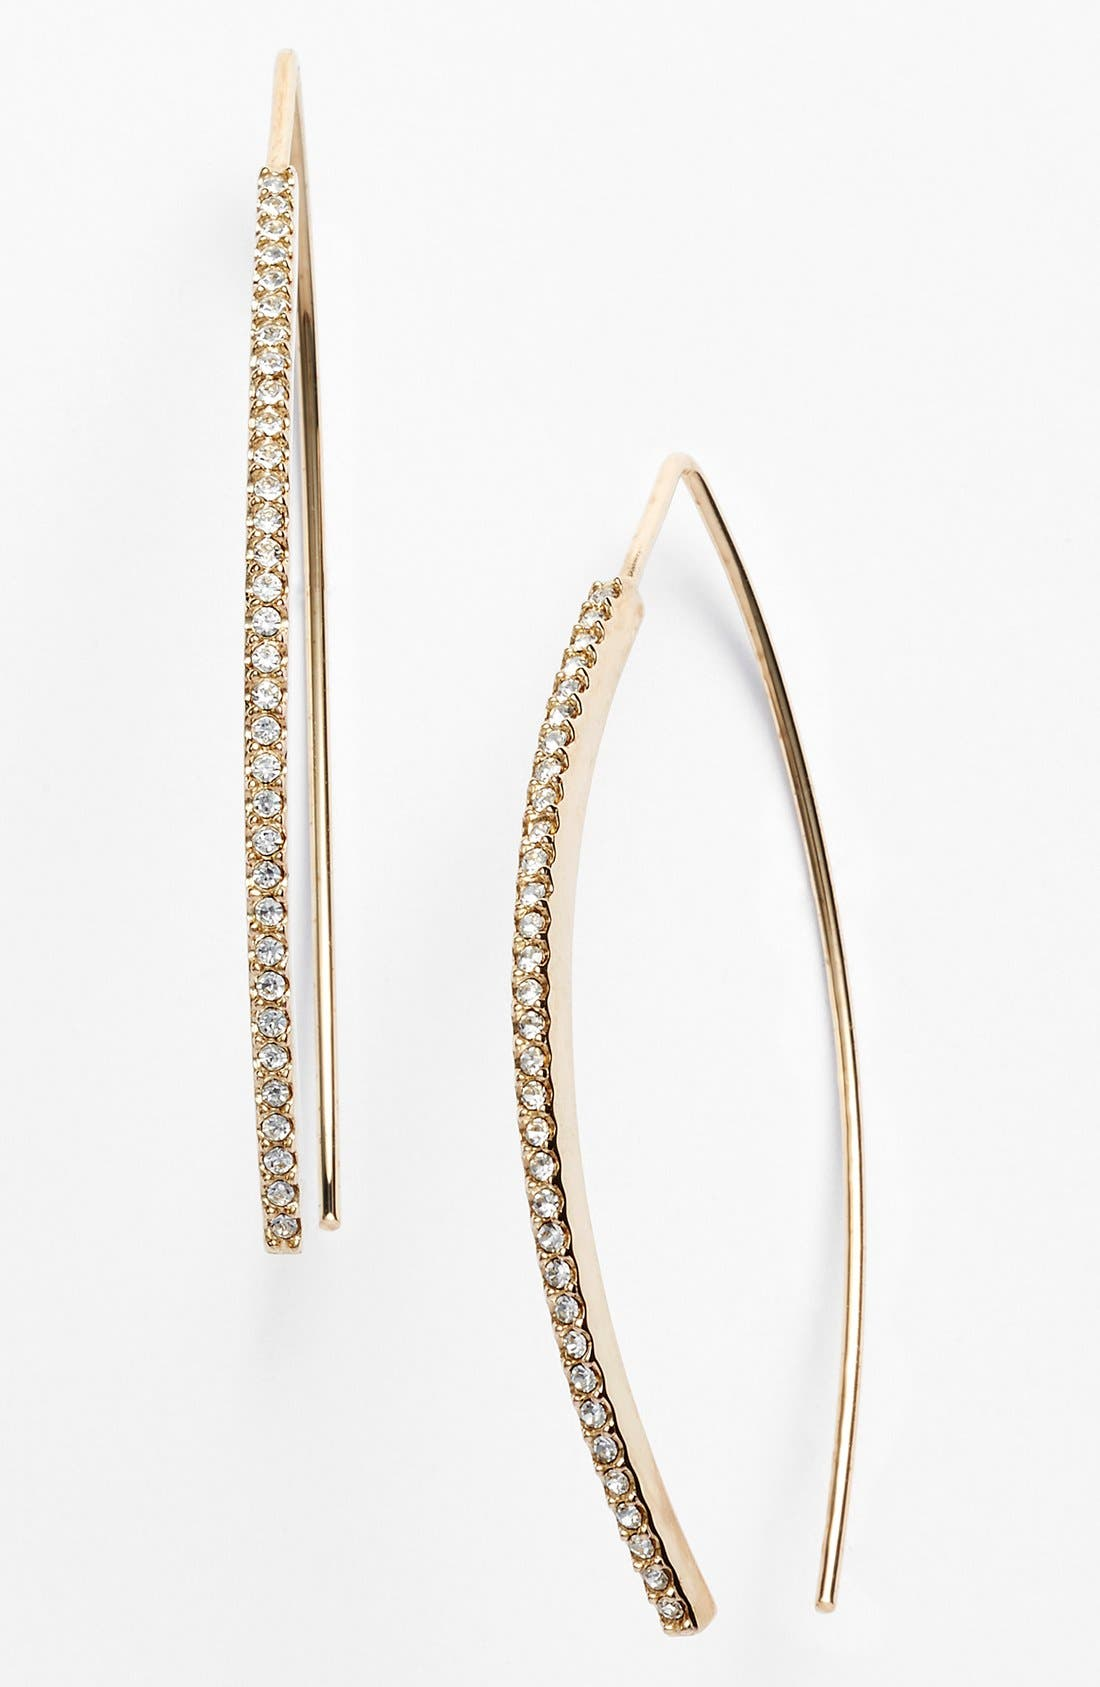 Alternate Image 1 Selected - Judith Jack Linear Earrings